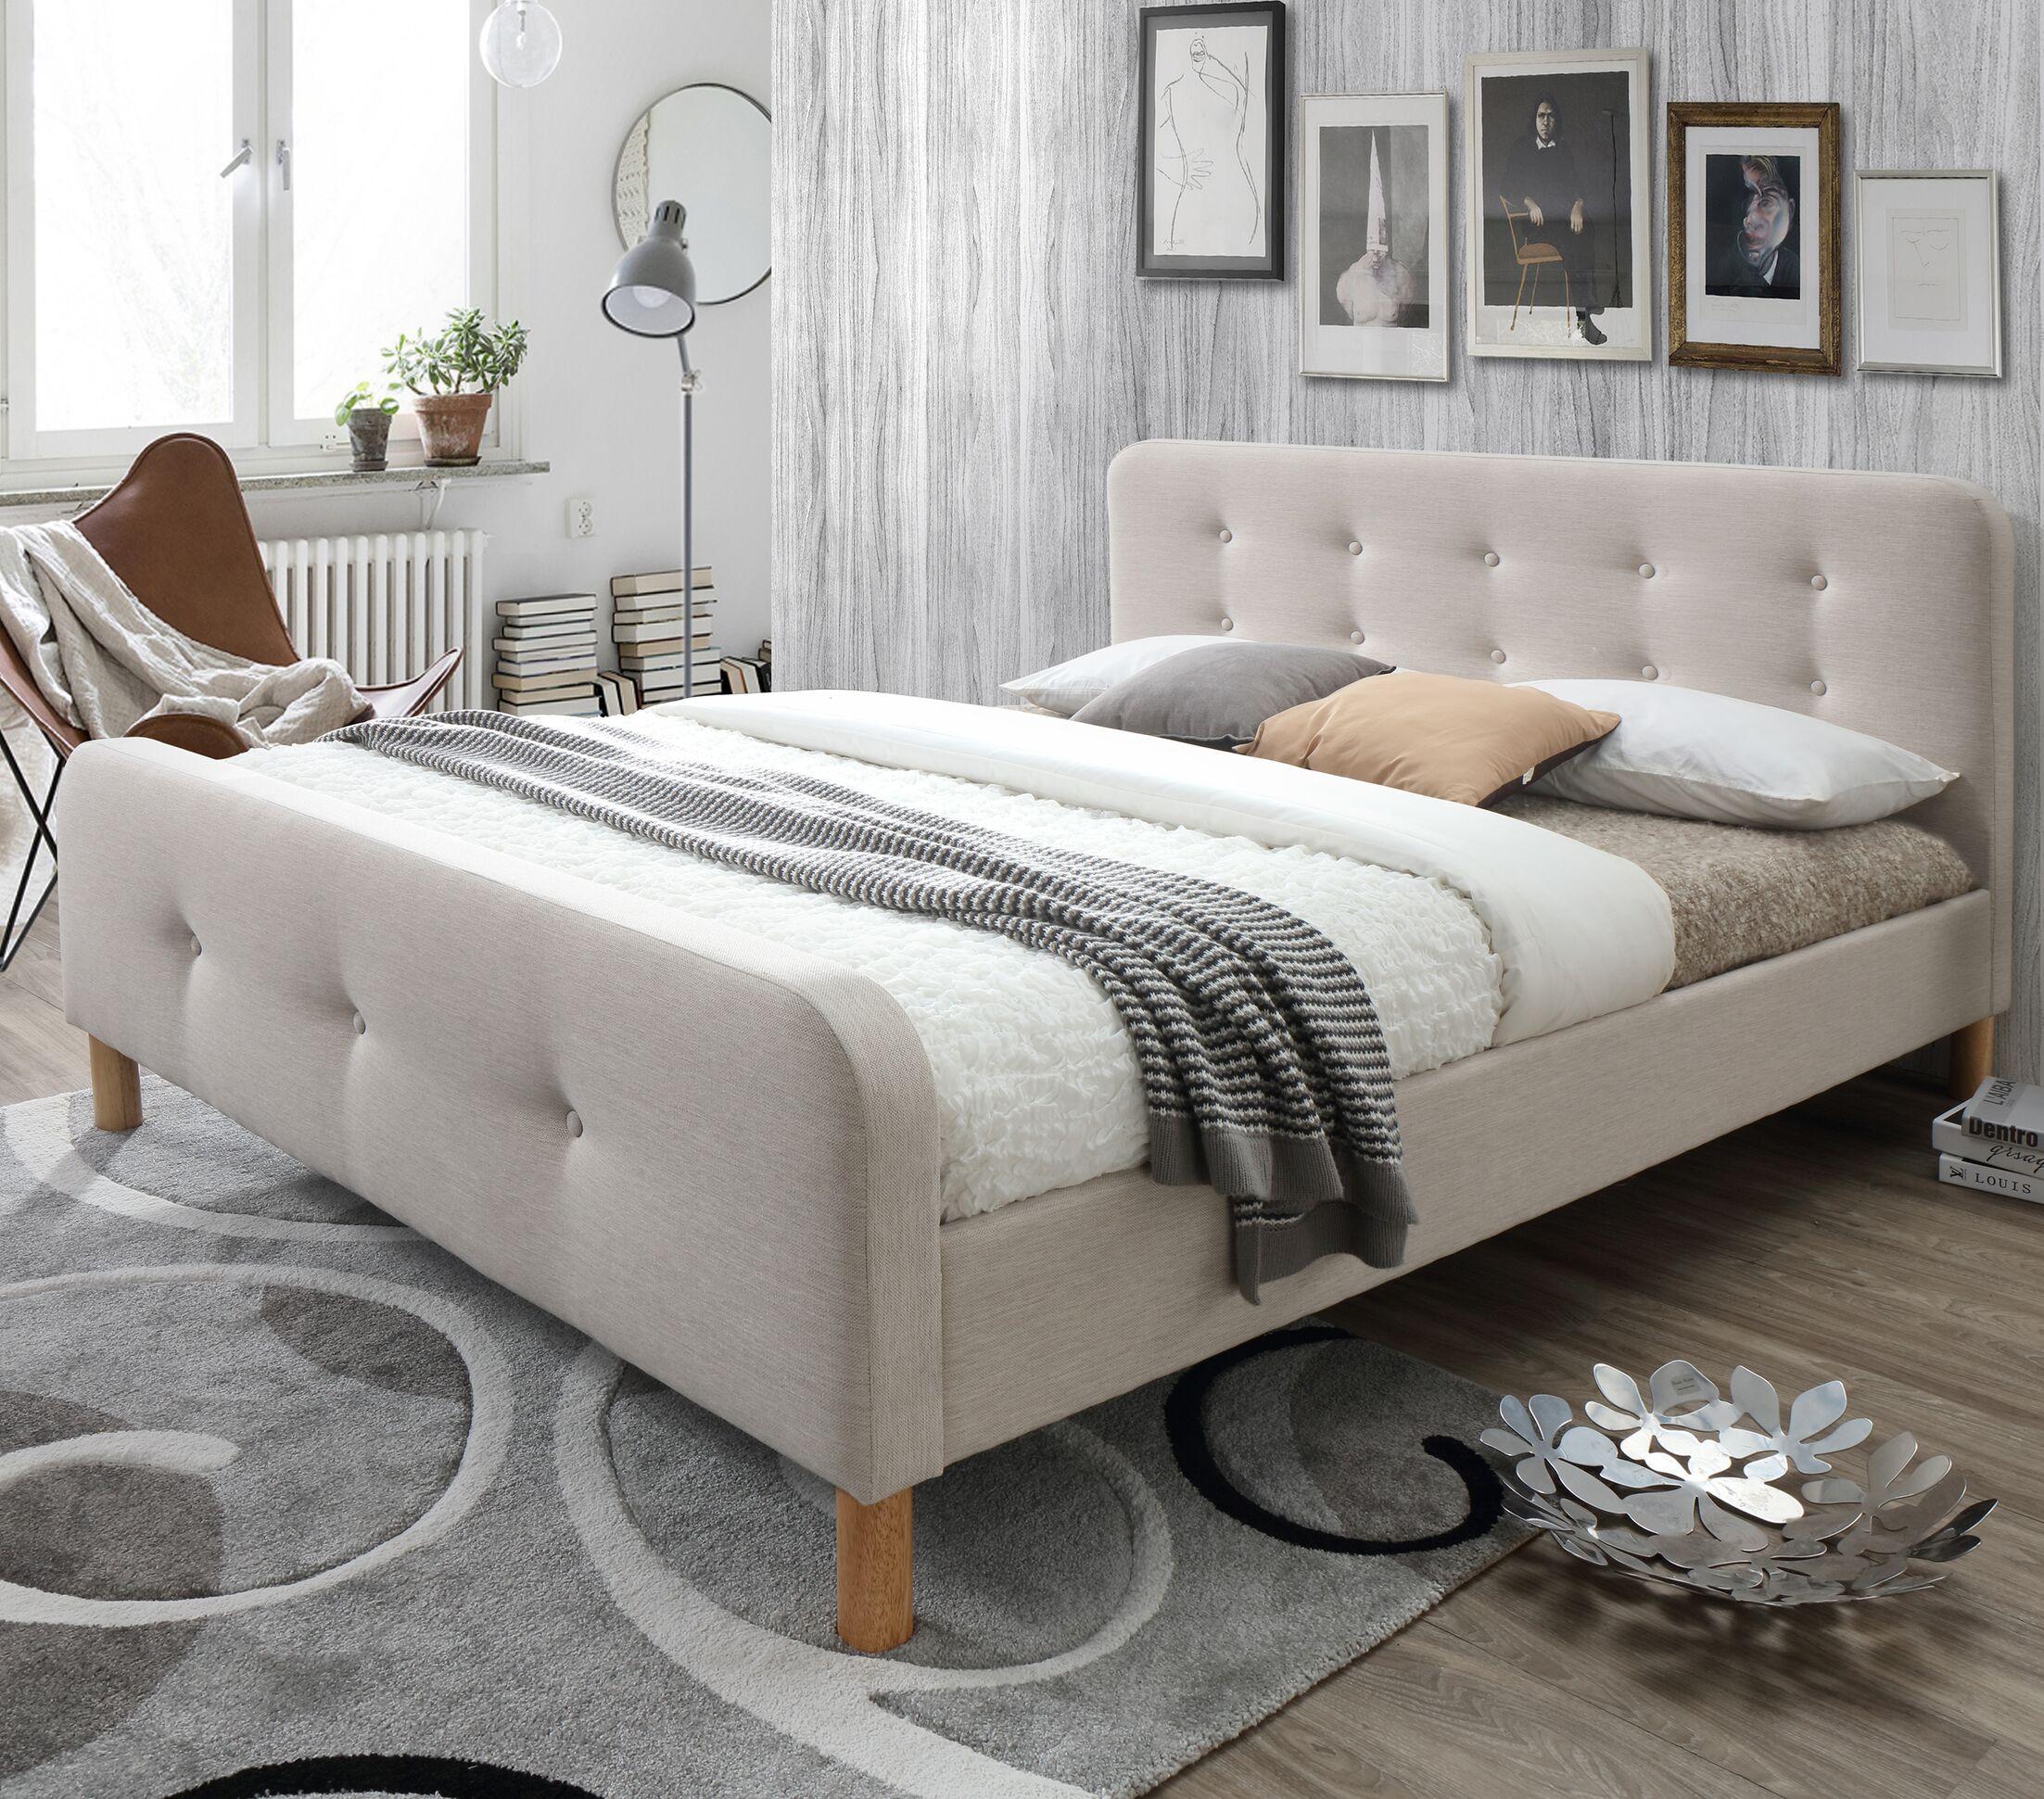 Riccardo Mid-Century Fabric Upholstered Platform Bed Size: King, Color: Light Beige